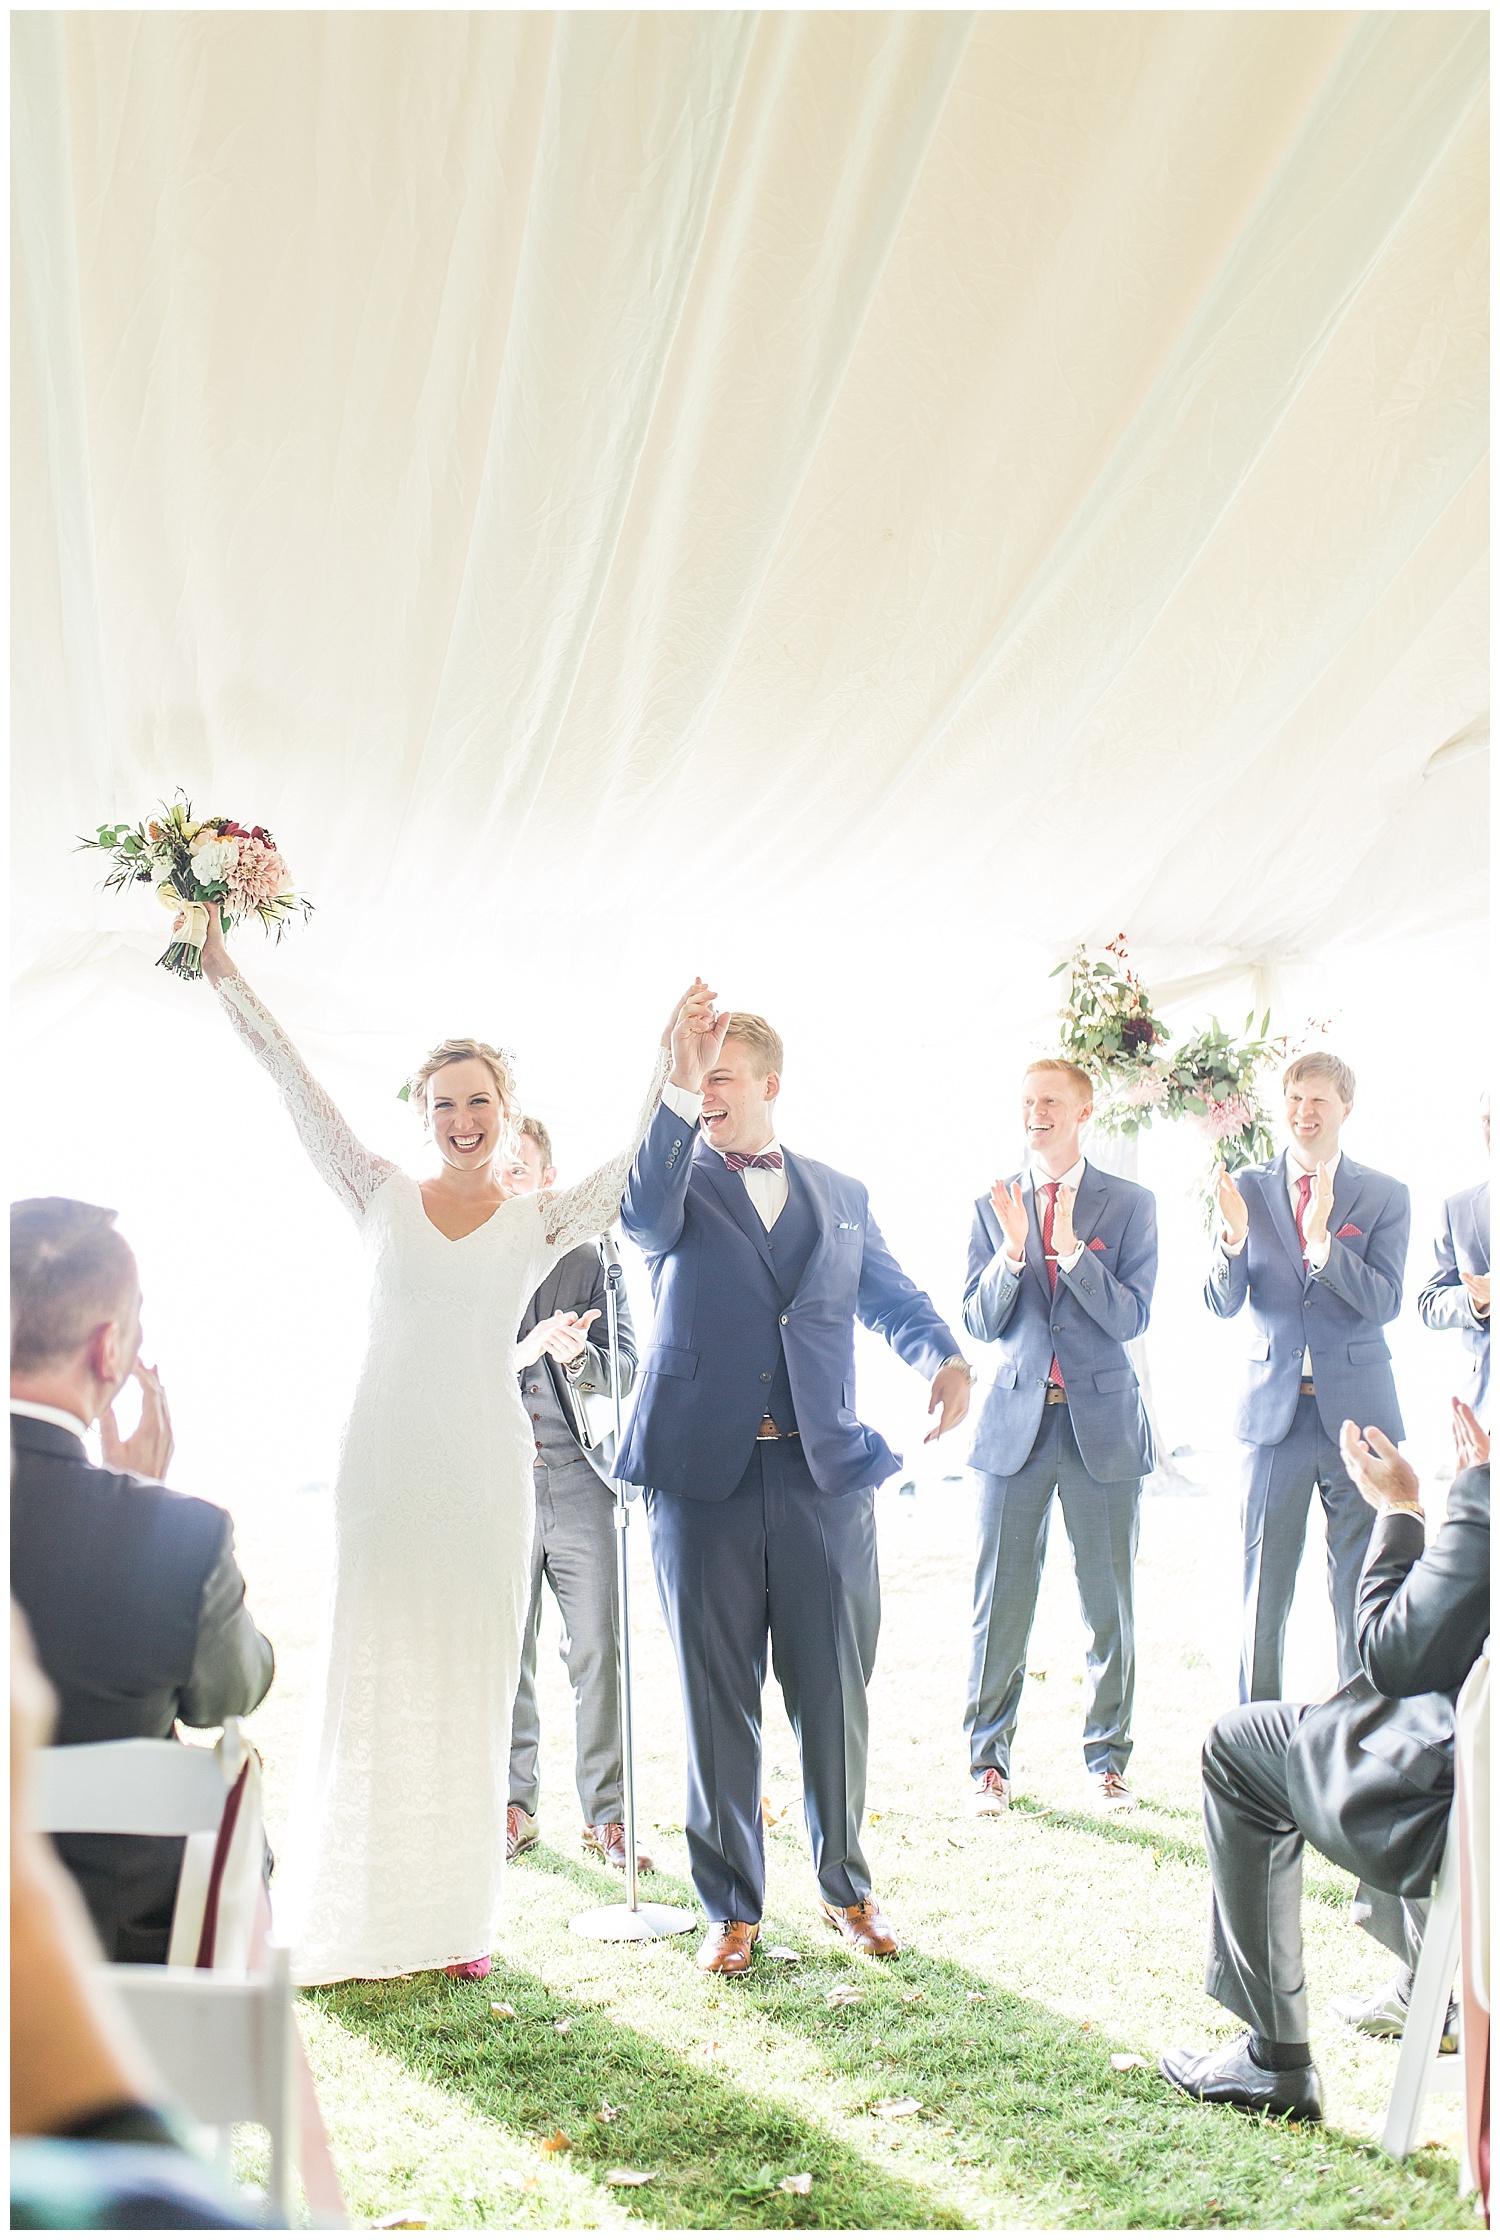 Margaret and Colin - Inns of Aurora - Lass and Beau-1086_Buffalo wedding photography.jpg